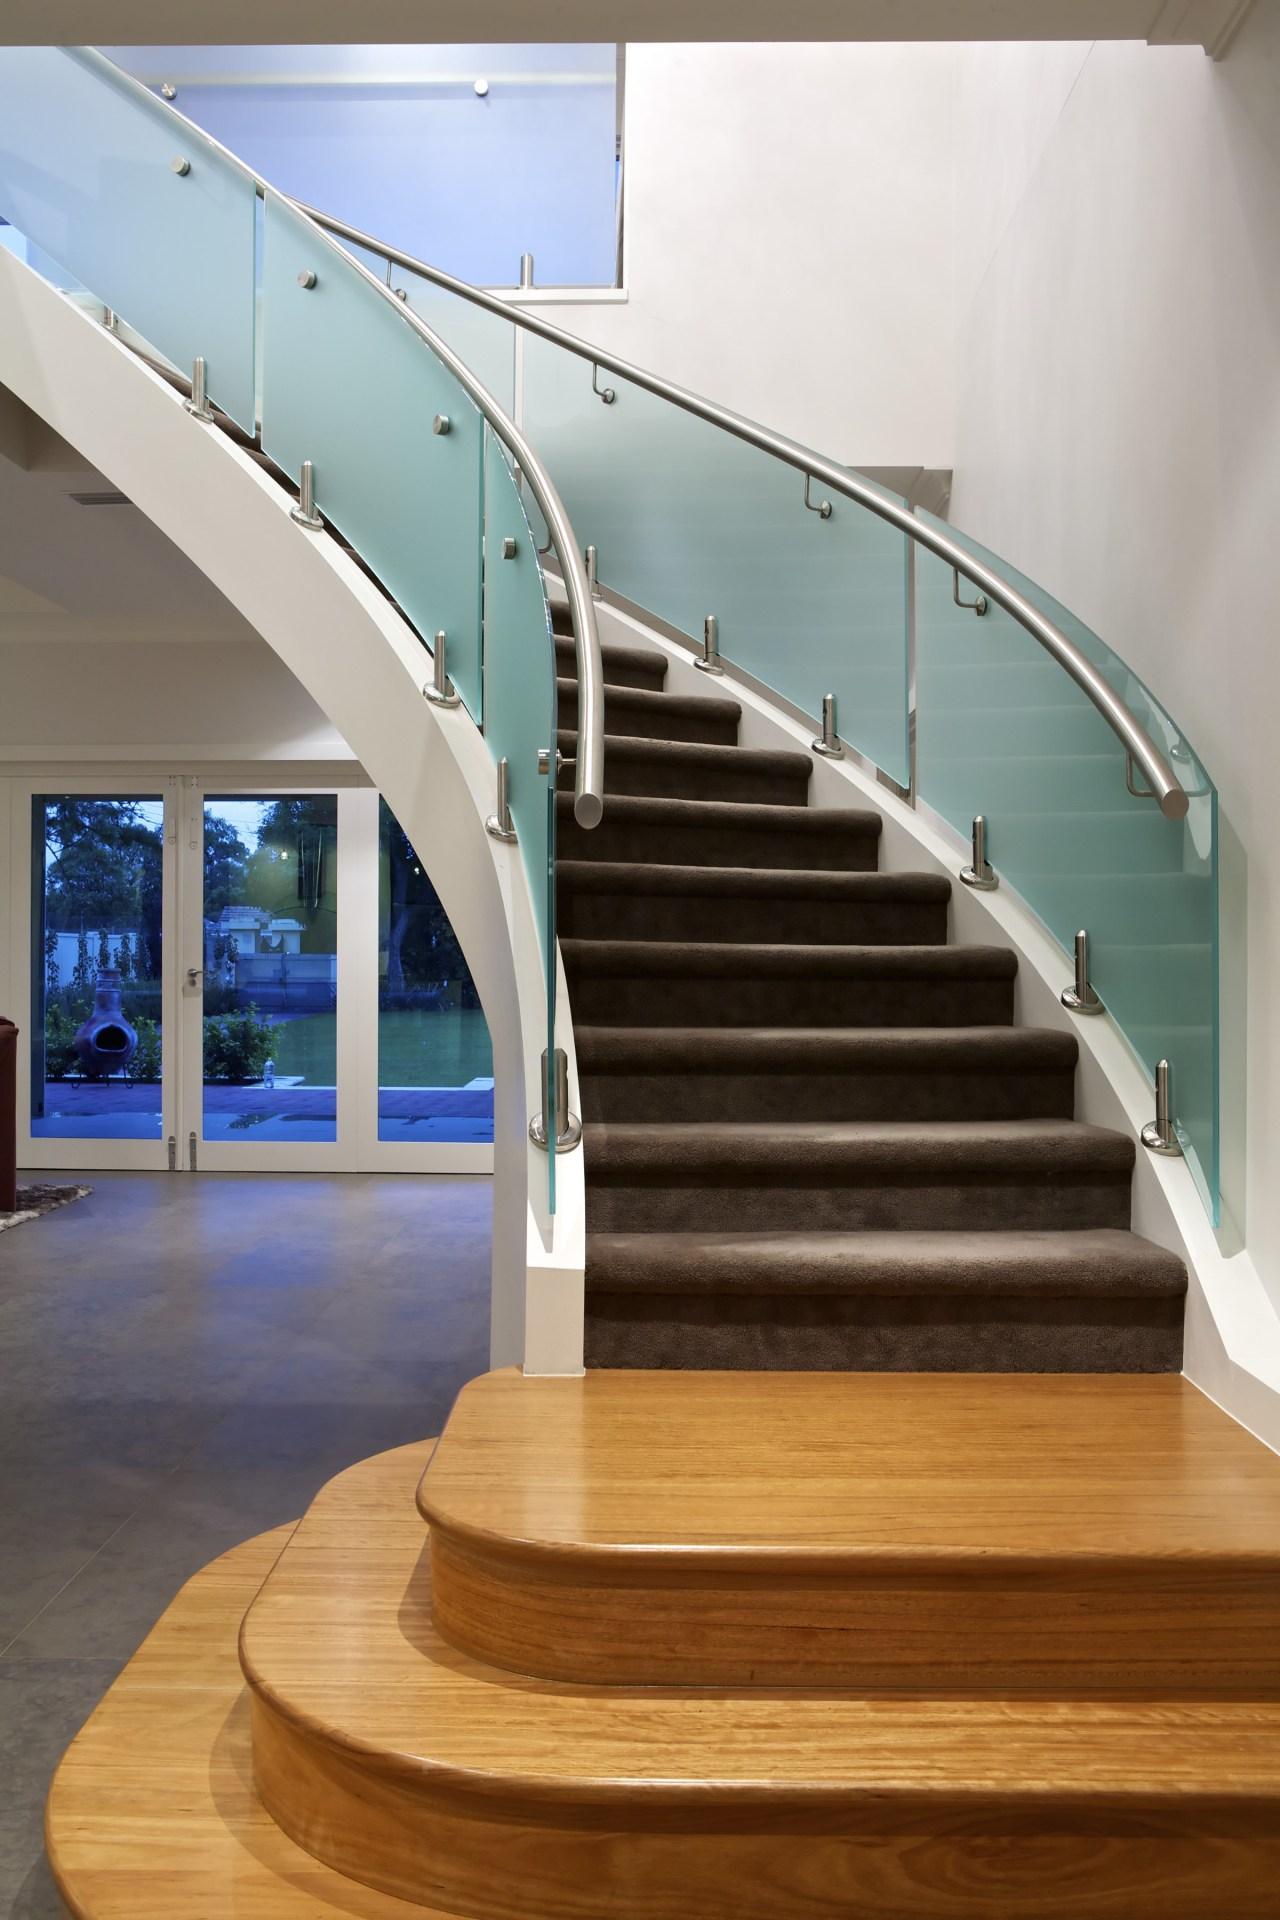 Glass staircase. daylighting, floor, glass, handrail, hardwood, interior design, stairs, wood